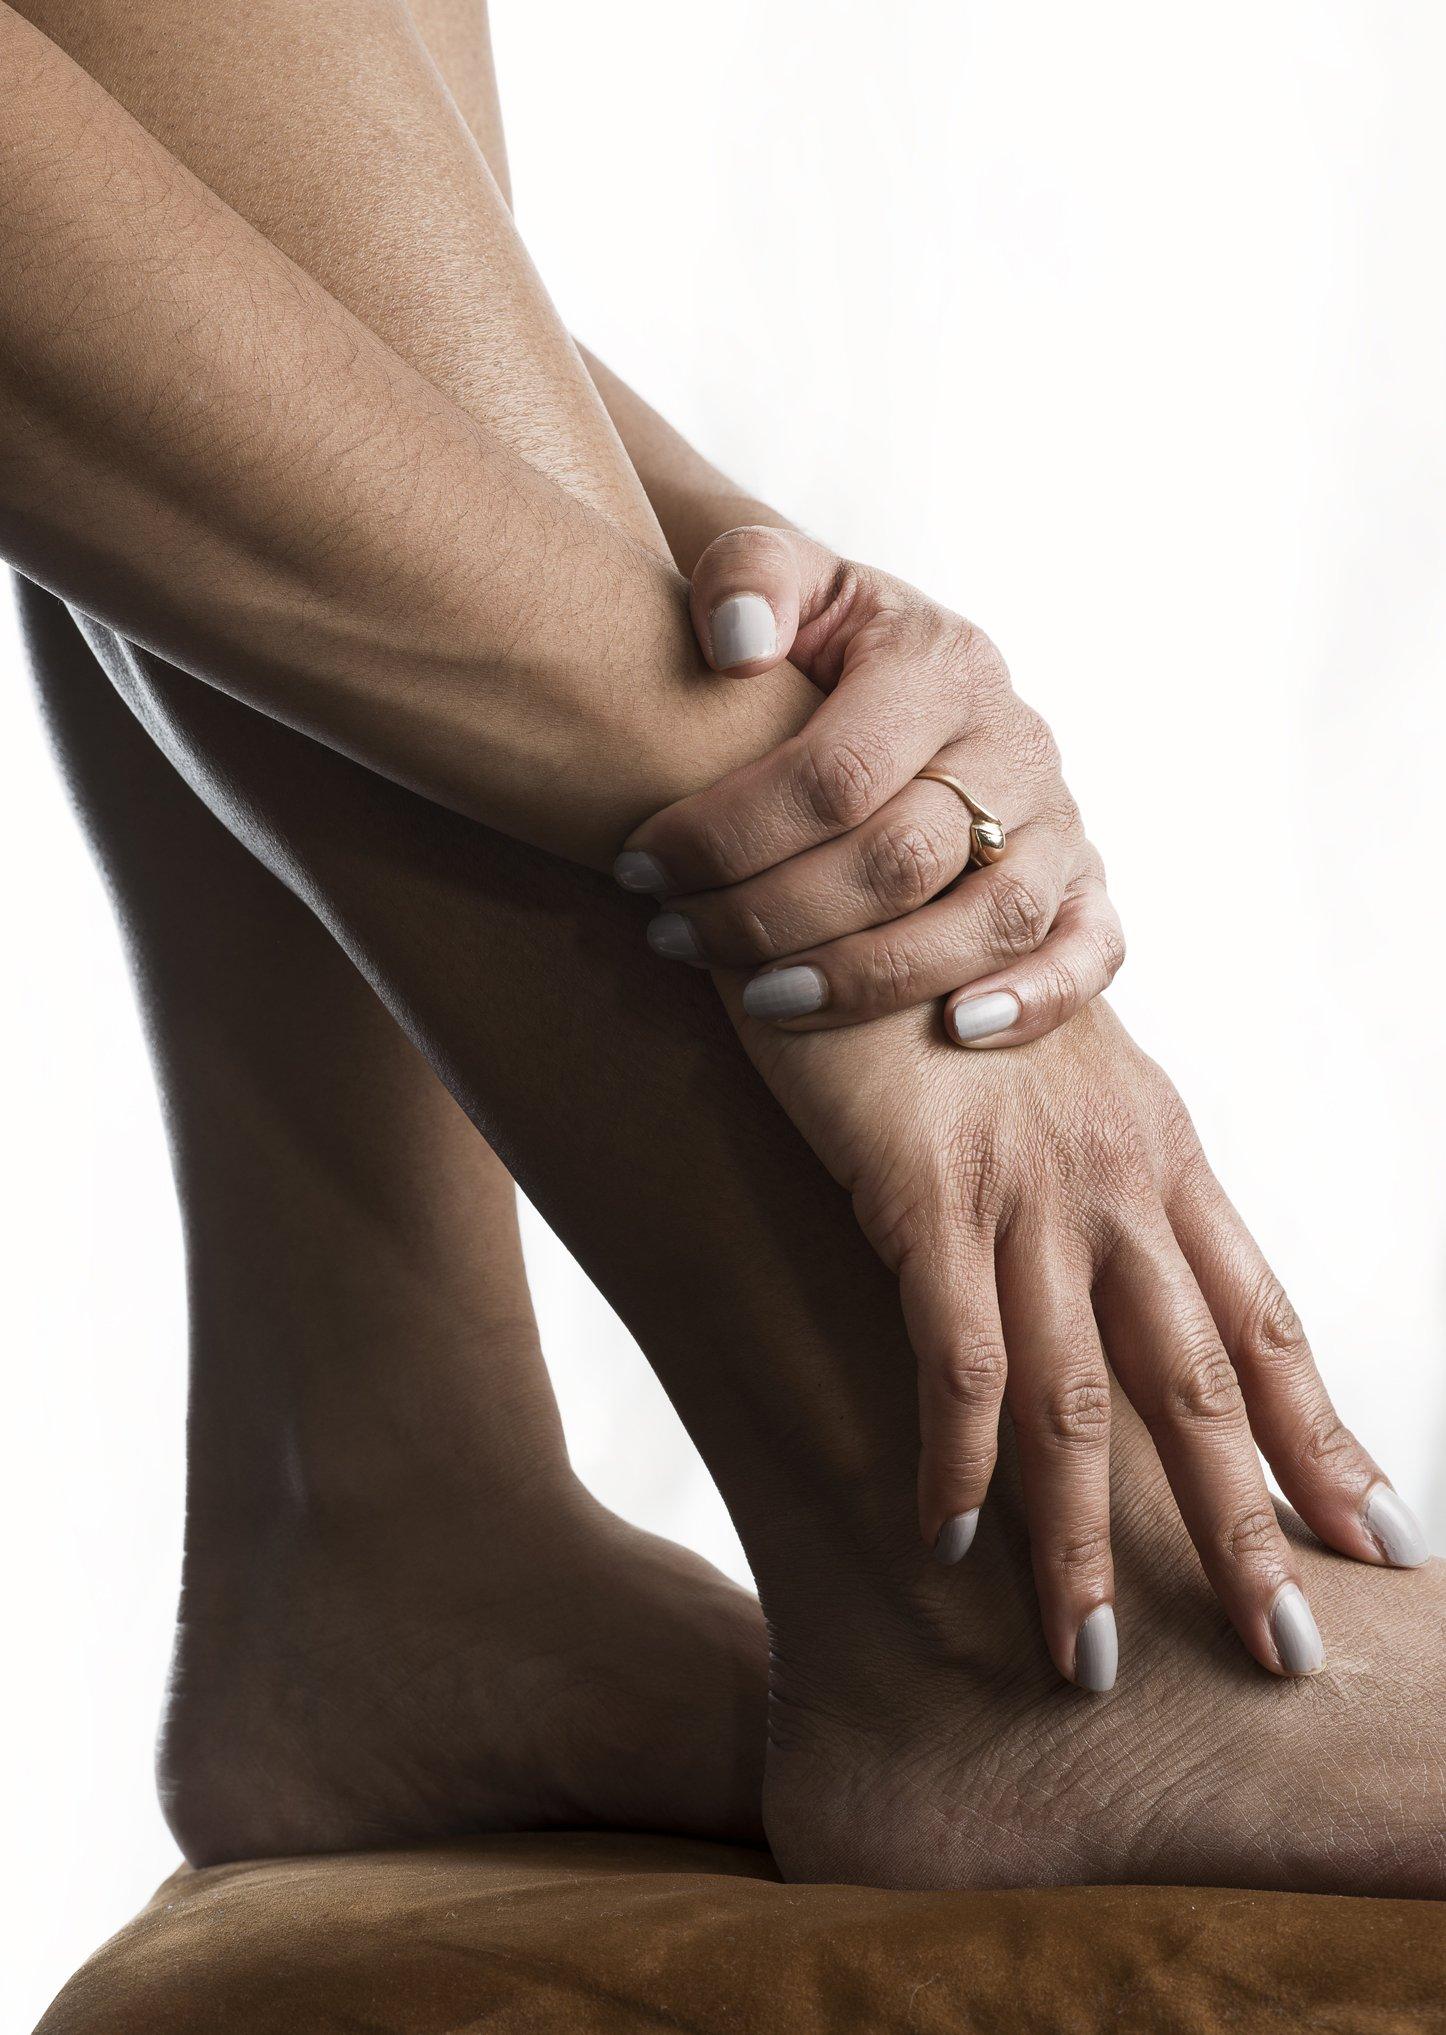 hands-on-ankles.jpg